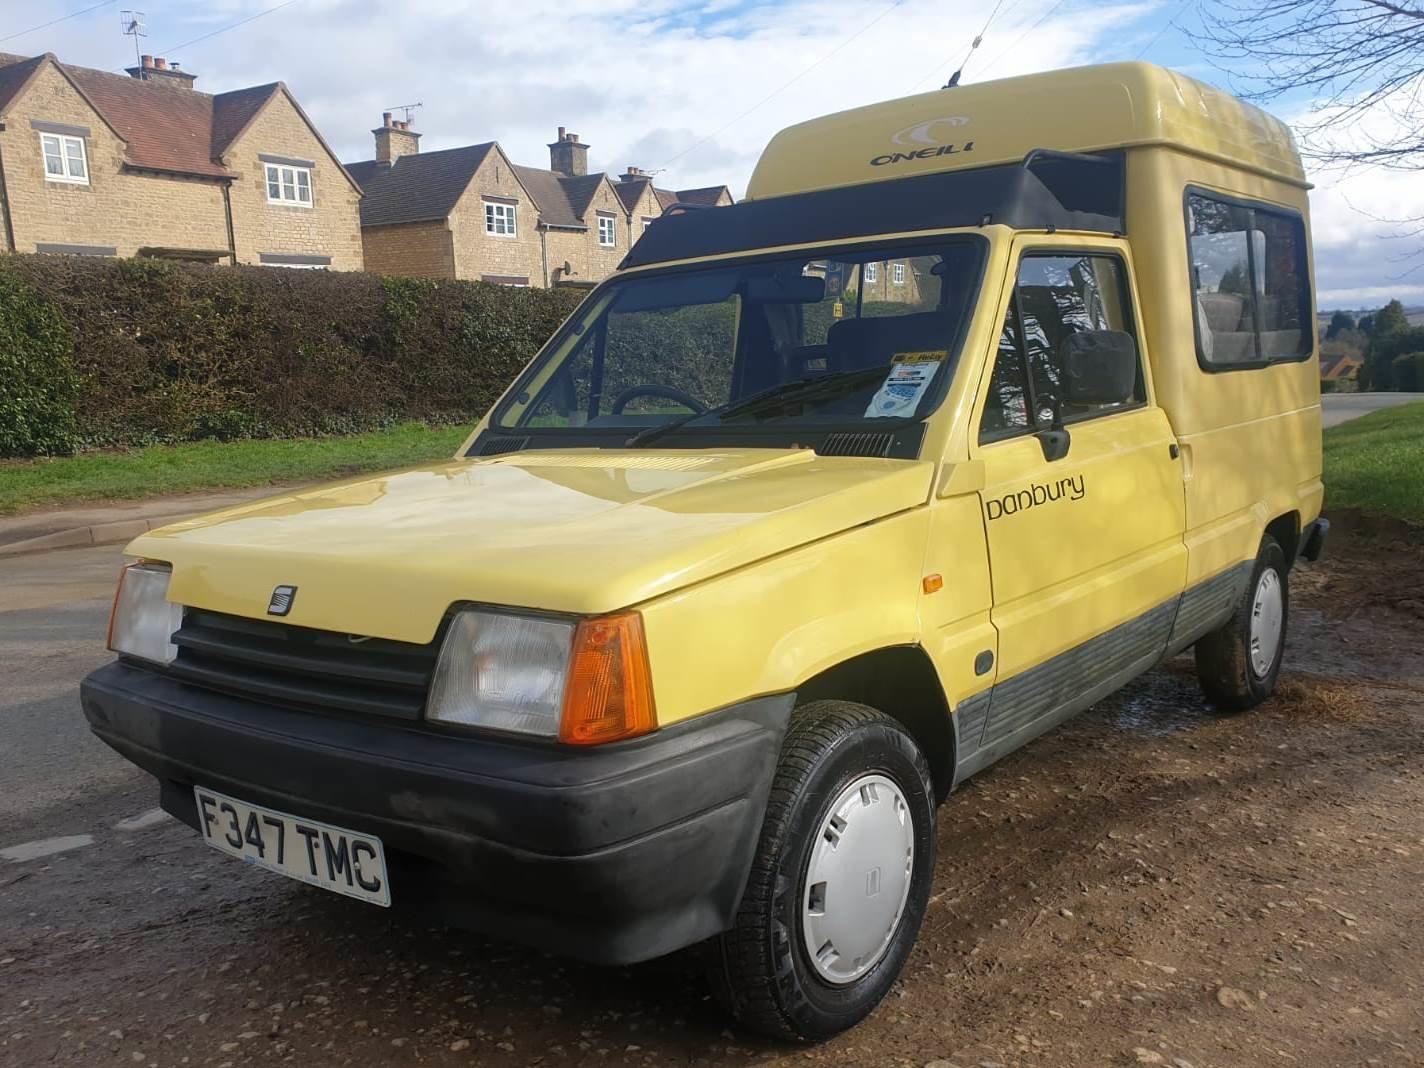 1989 Rare Seat Terra Danbury Campervan For Sale (picture 1 of 6)